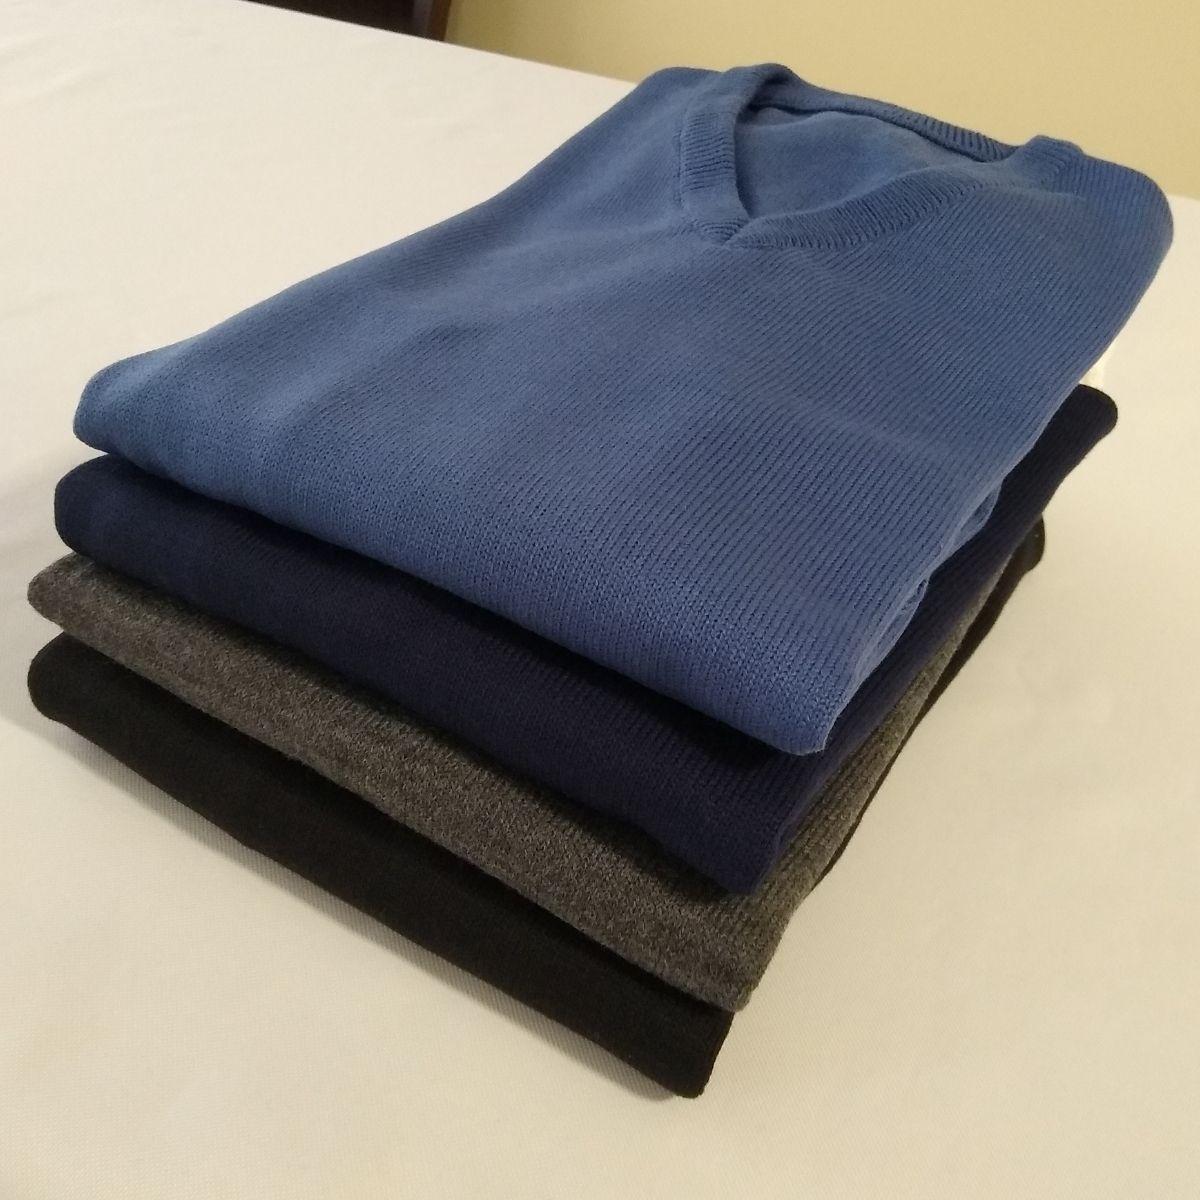 Sueter Masculino Blusa De Lã Gola V Plus Size (02 Unidades)